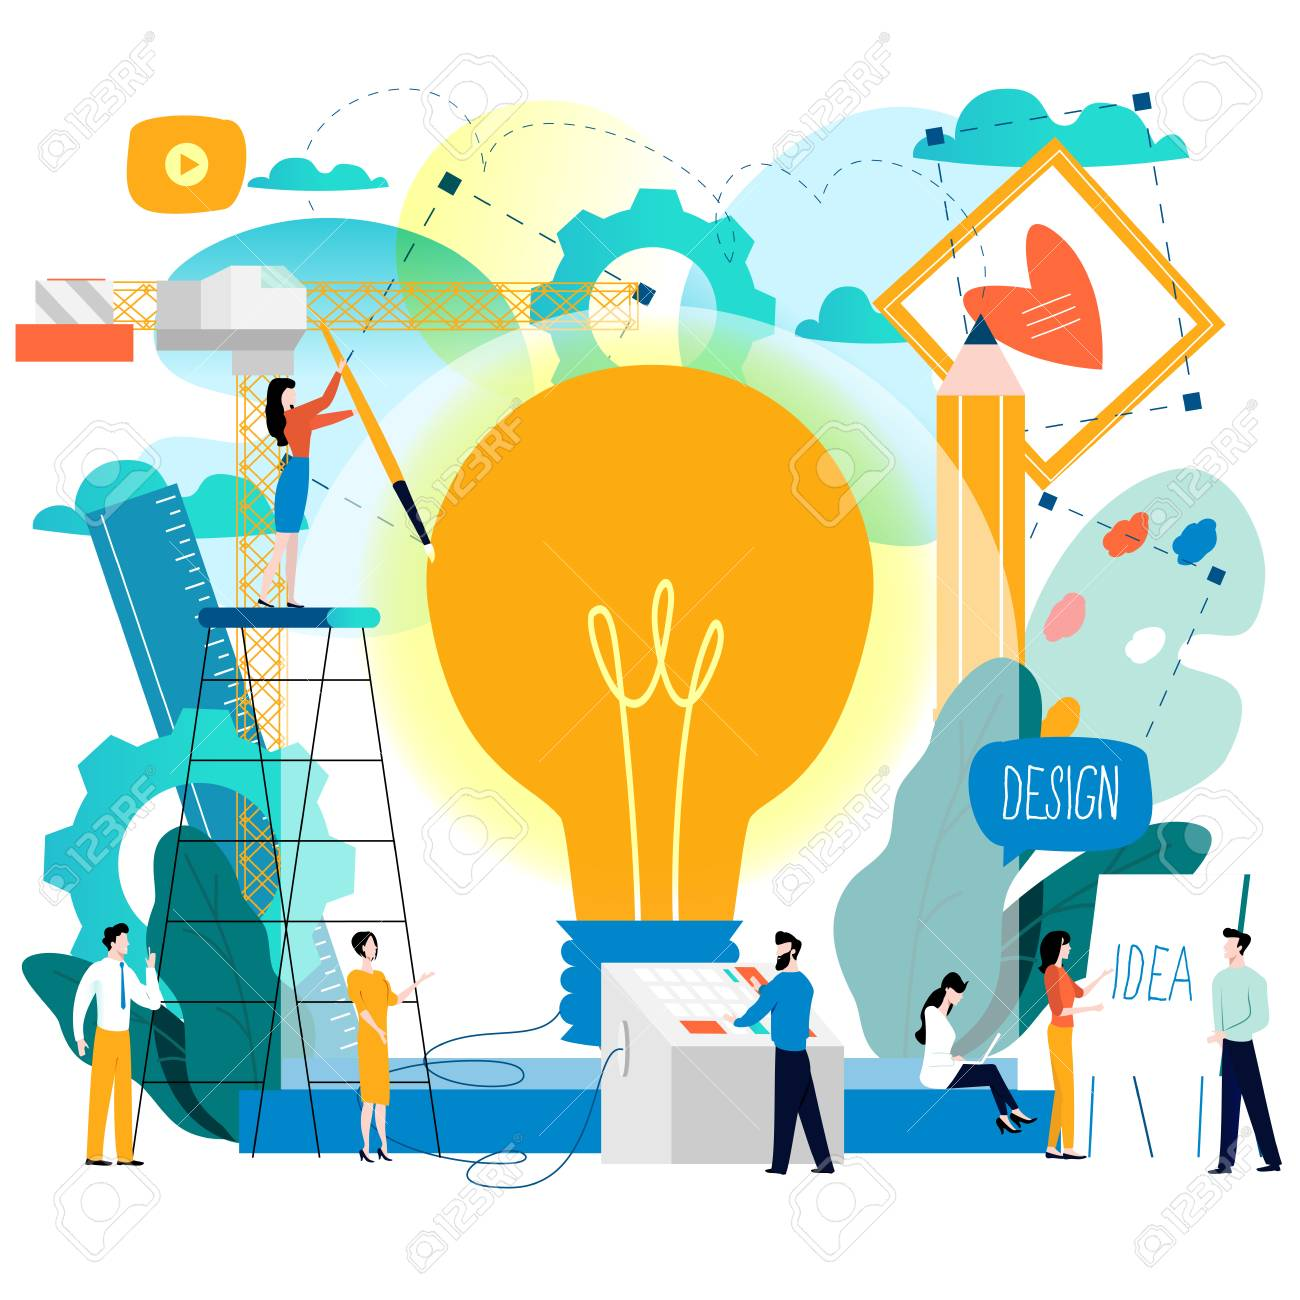 Creative Ideas Graphic Design Illustration Stock Vector